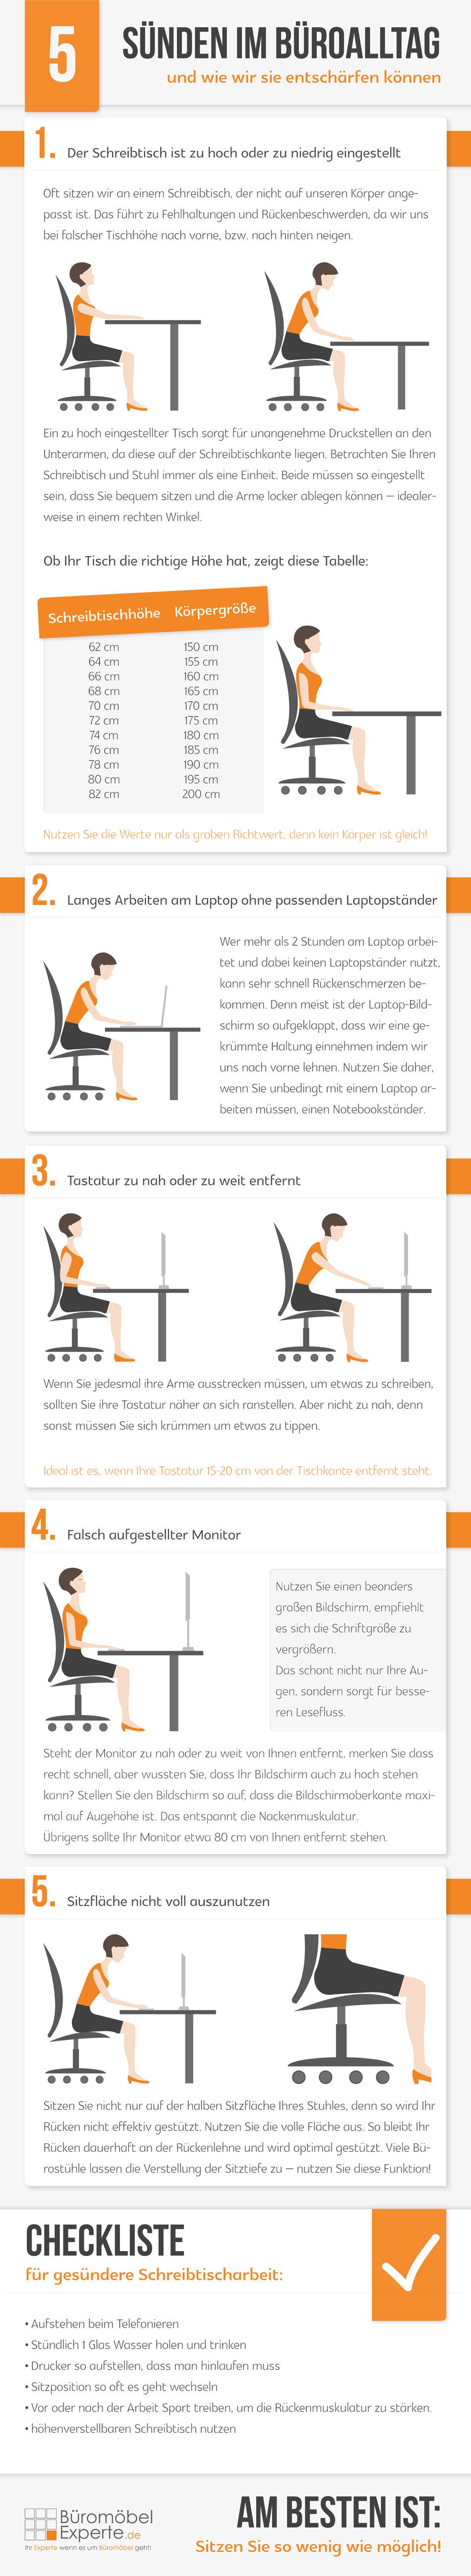 Infografik 5 Rücken-Sünden-im-Büroalltag